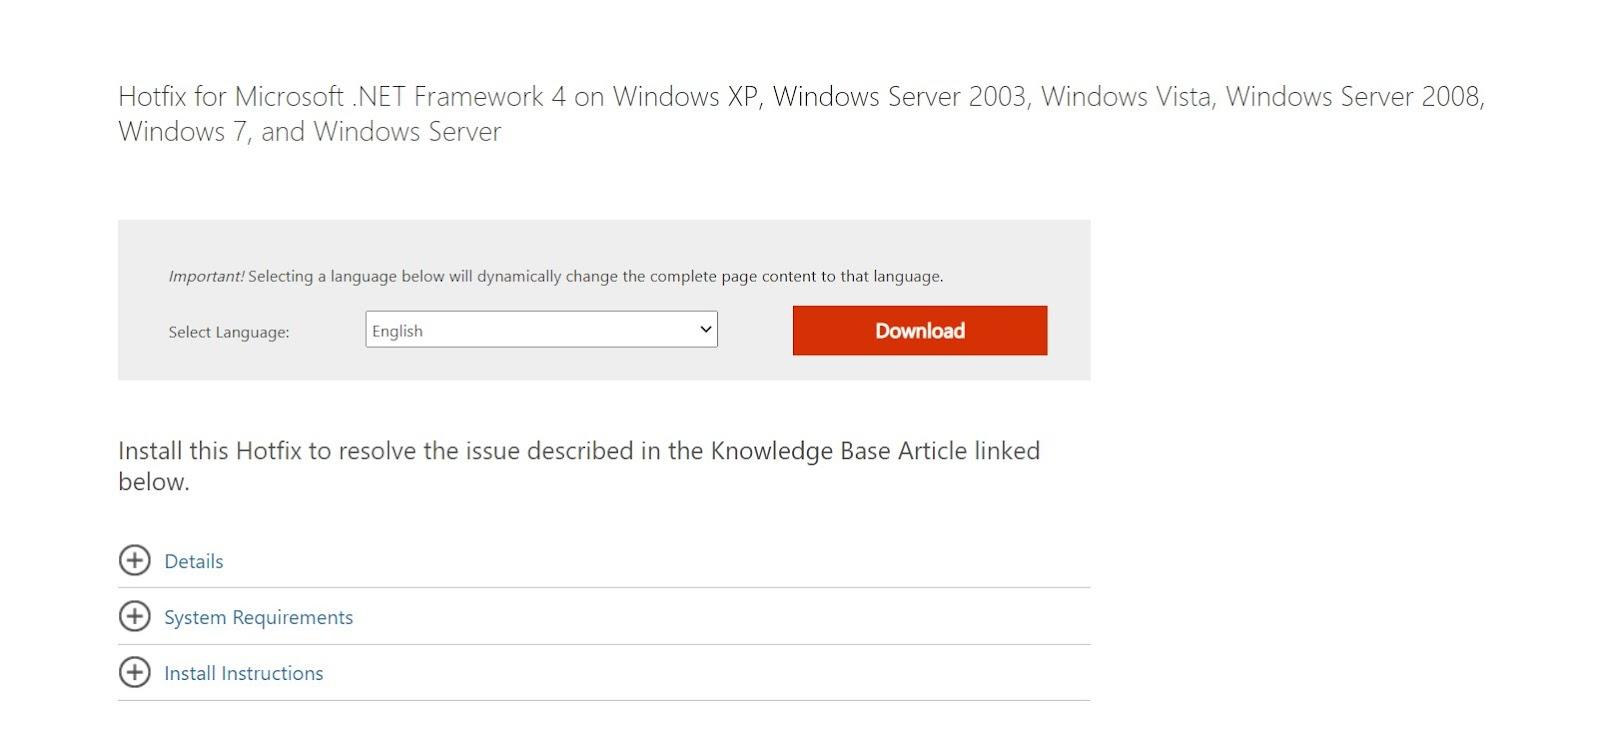 Microsoft Hotfix download webpage